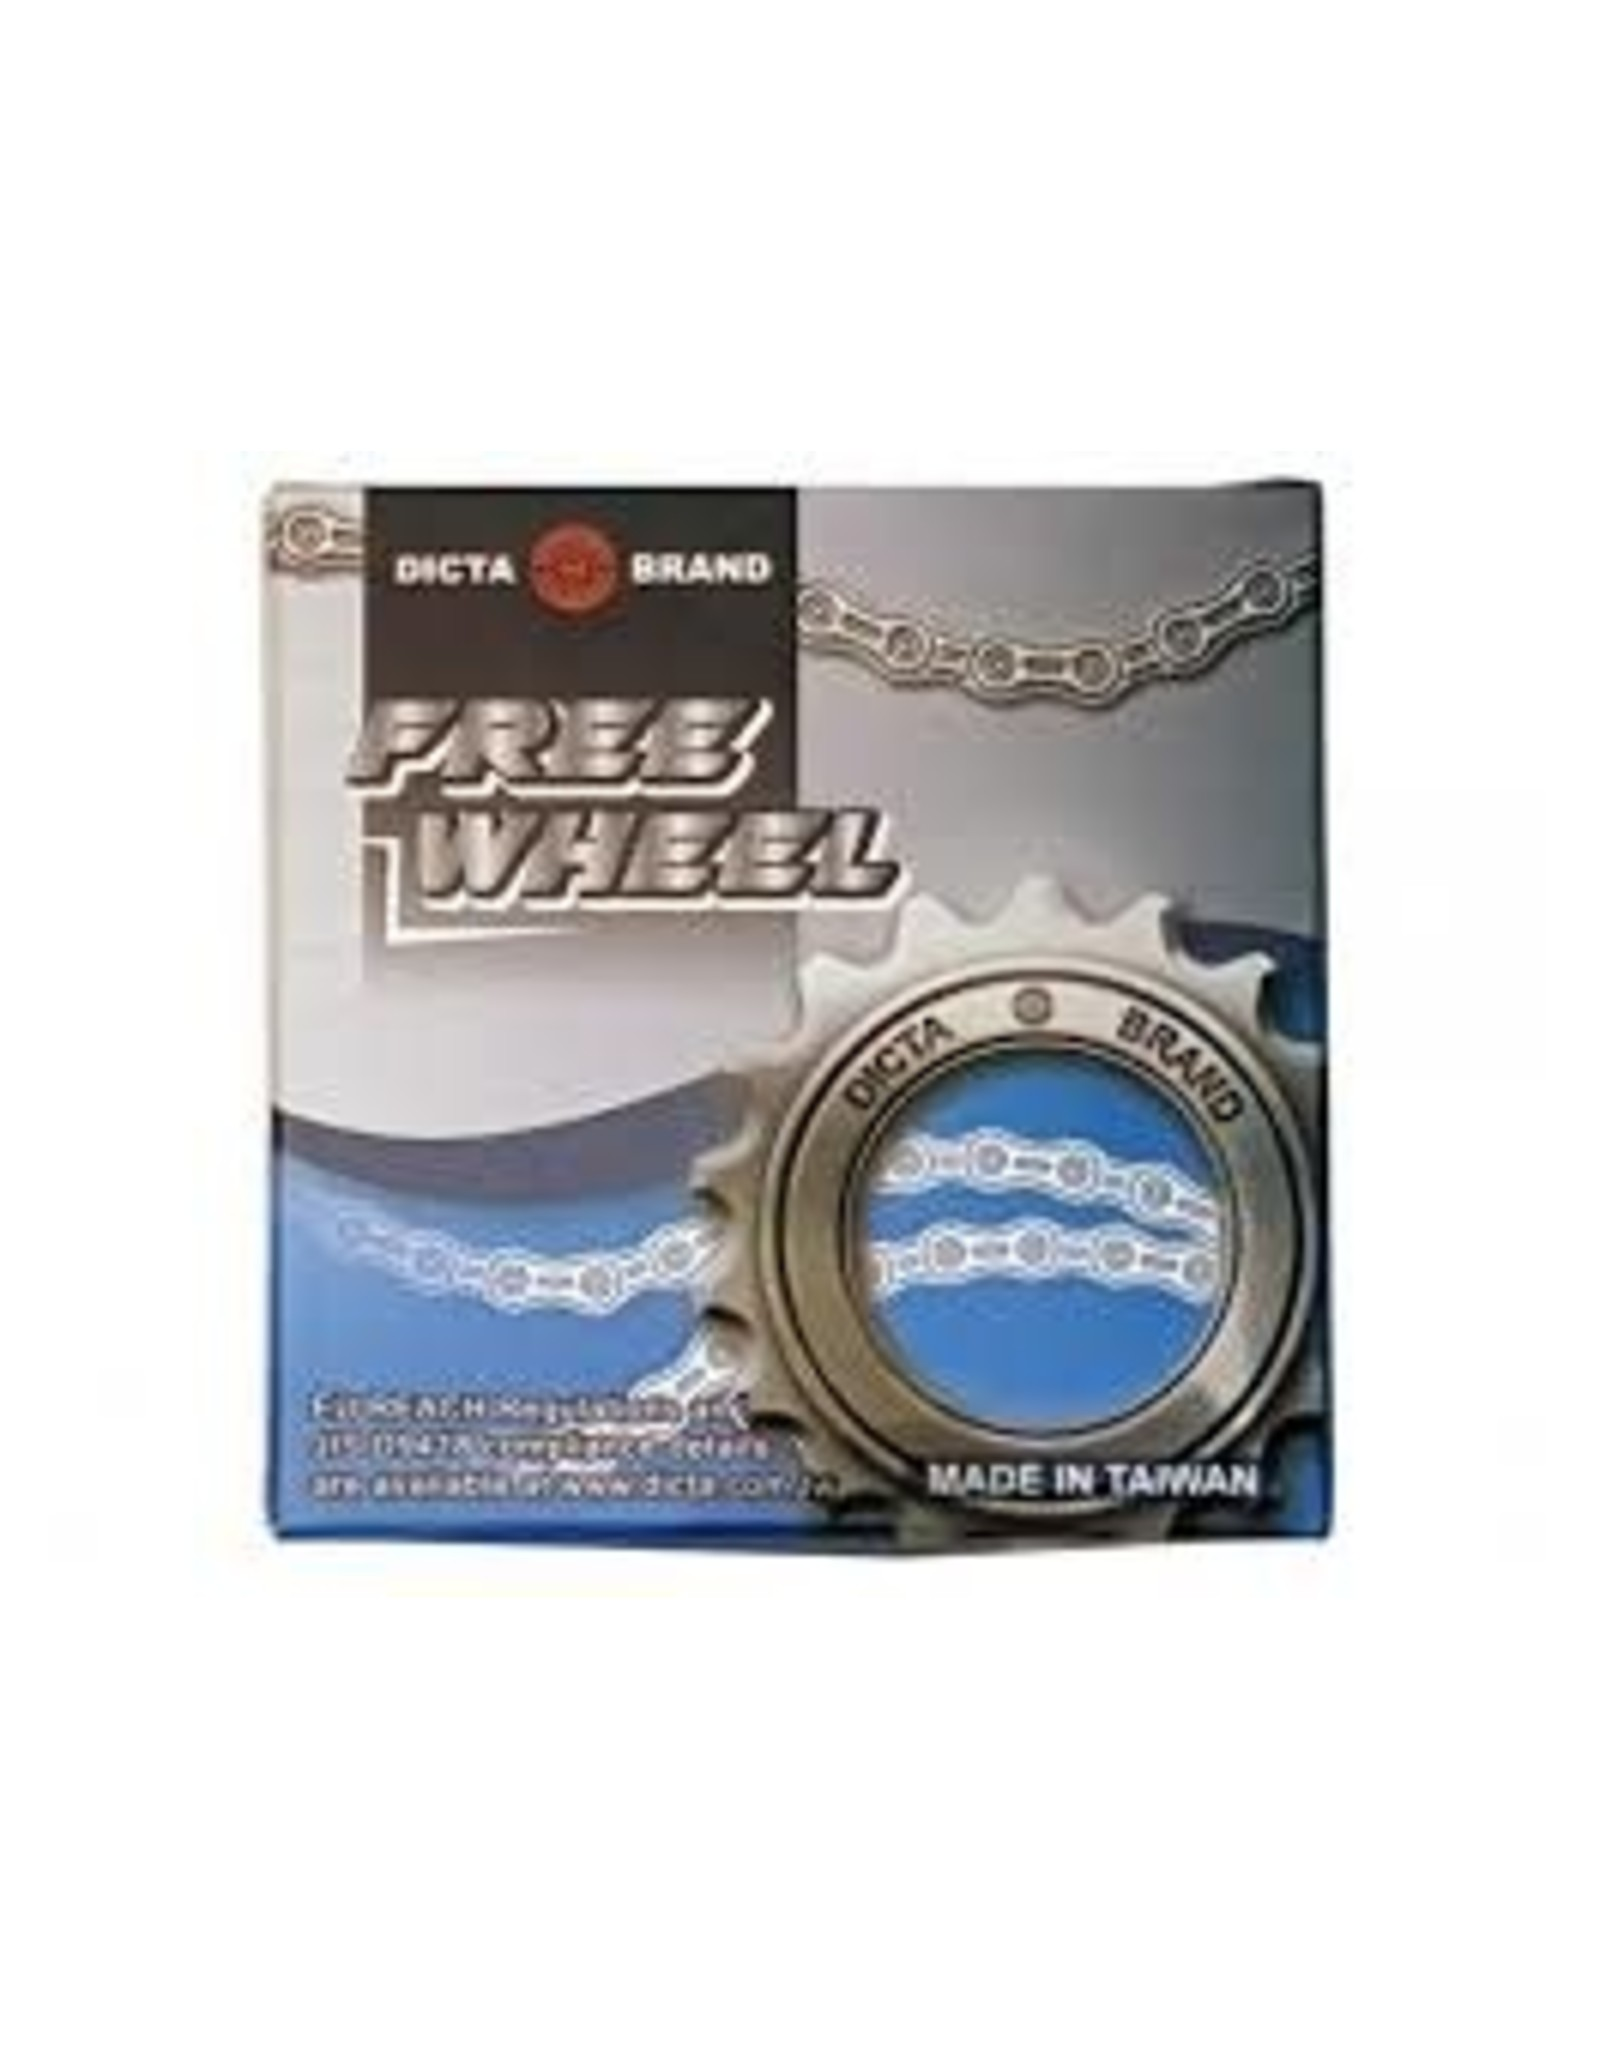 Dicta Brand Freewheel 1/2 x 3/32 ″